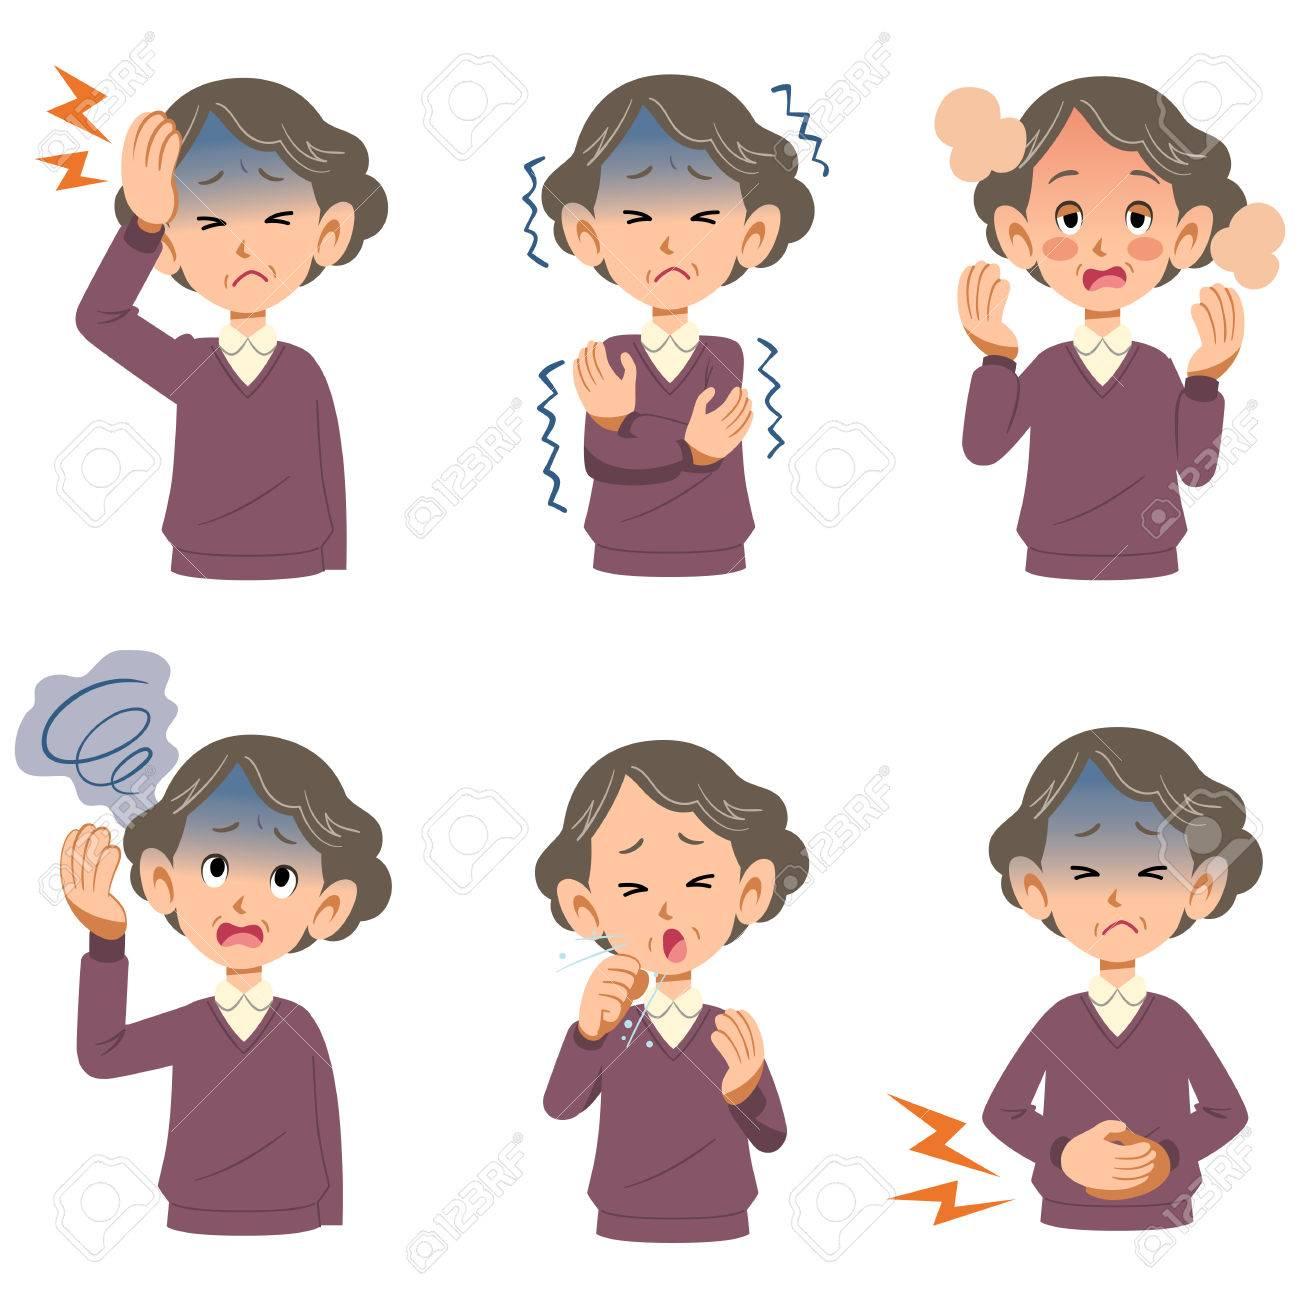 Symptoms of the disease of older women 6 - 59808426